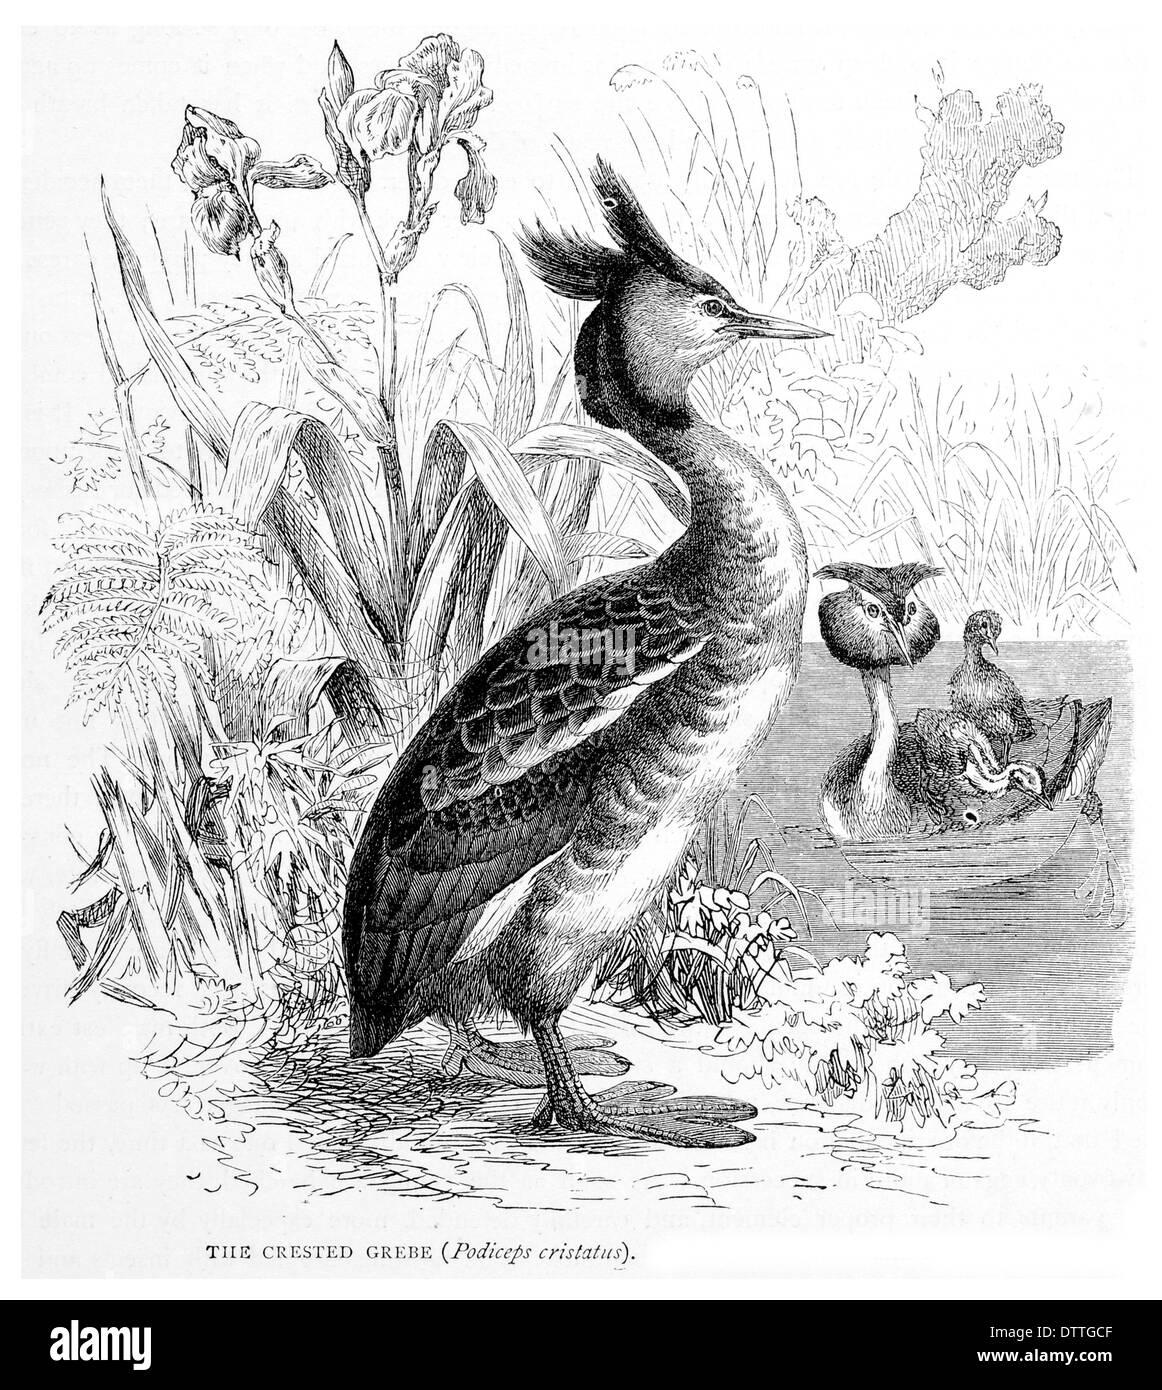 Crested Grebe Podiceps cristatus - Stock Image